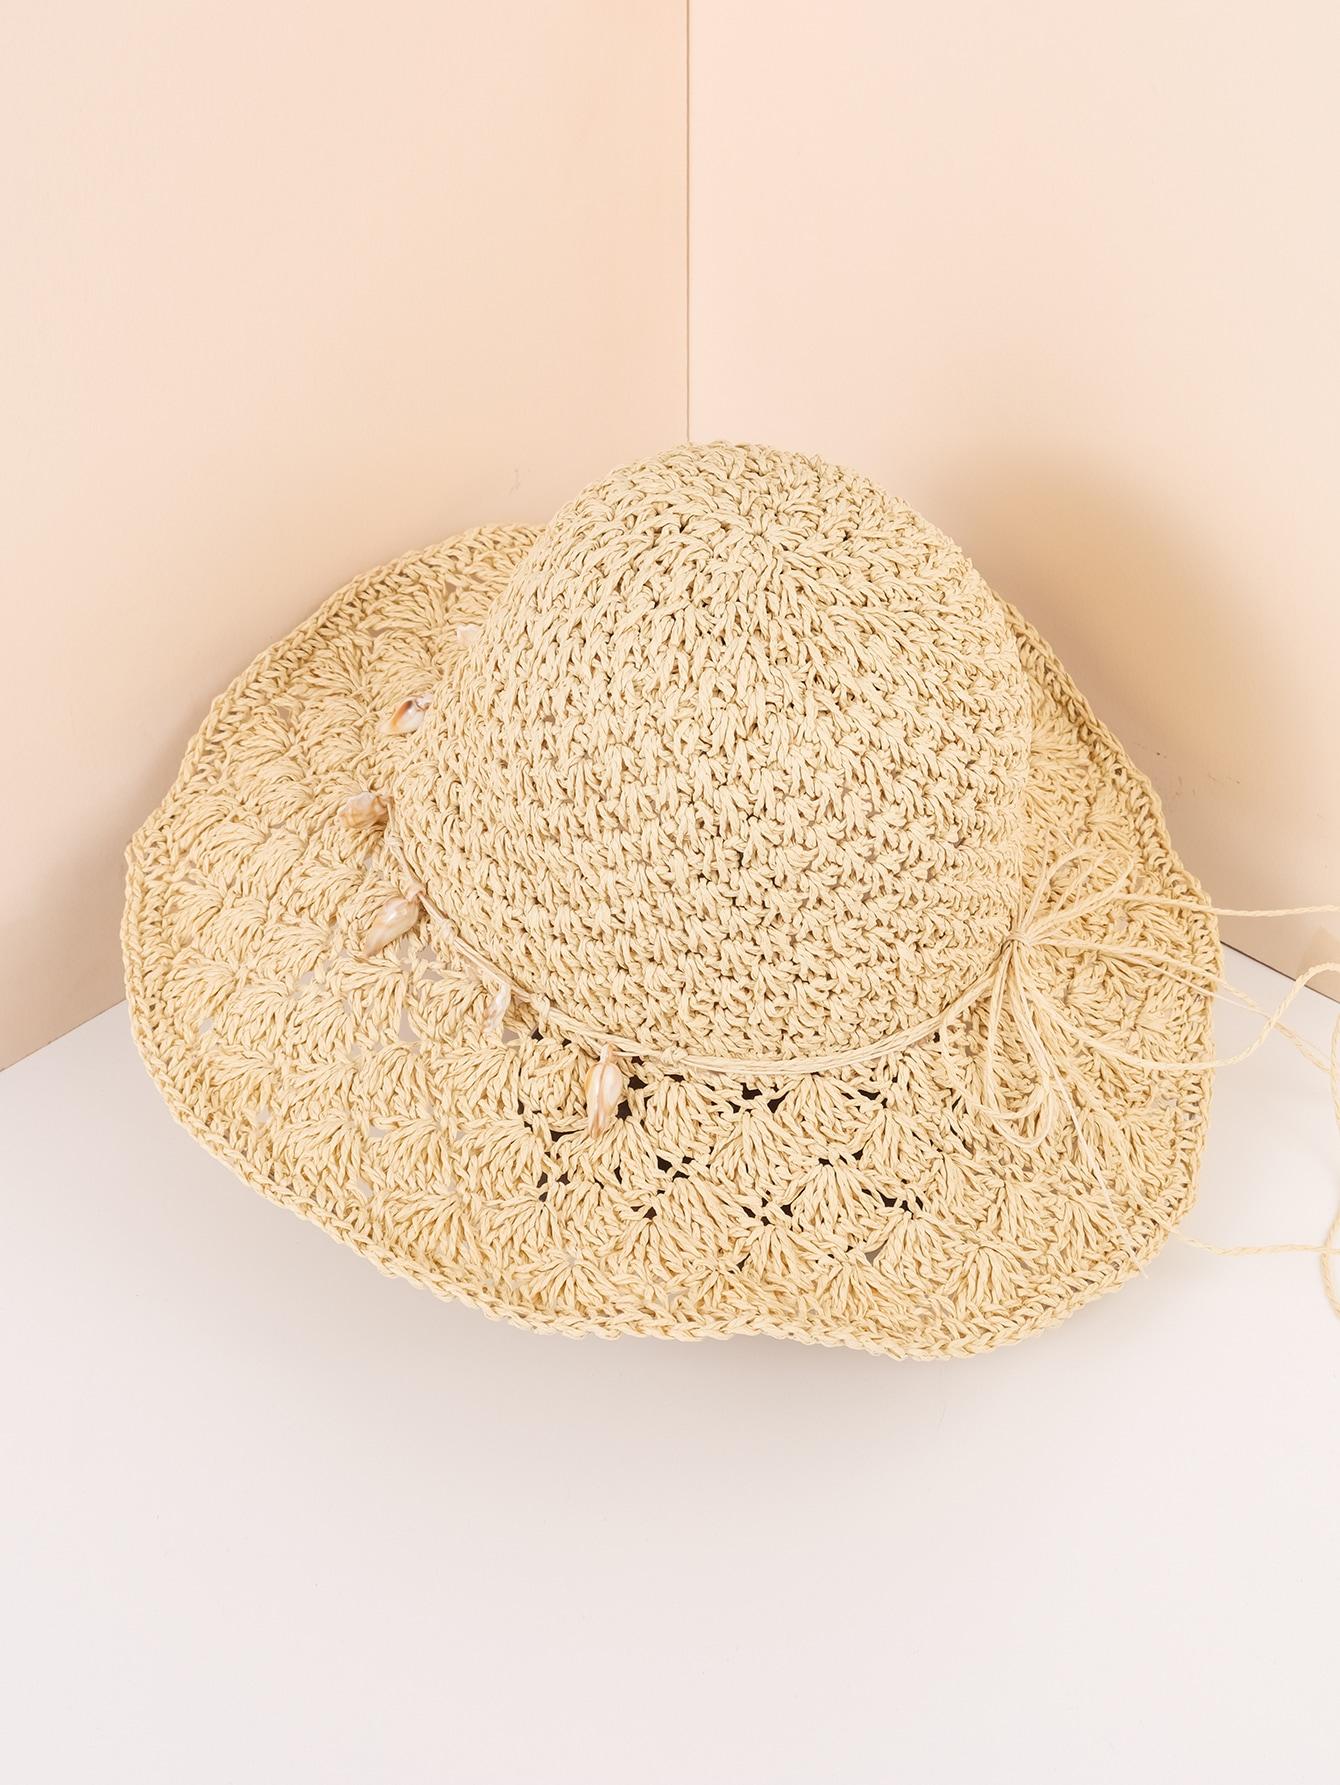 shell decor straw hat